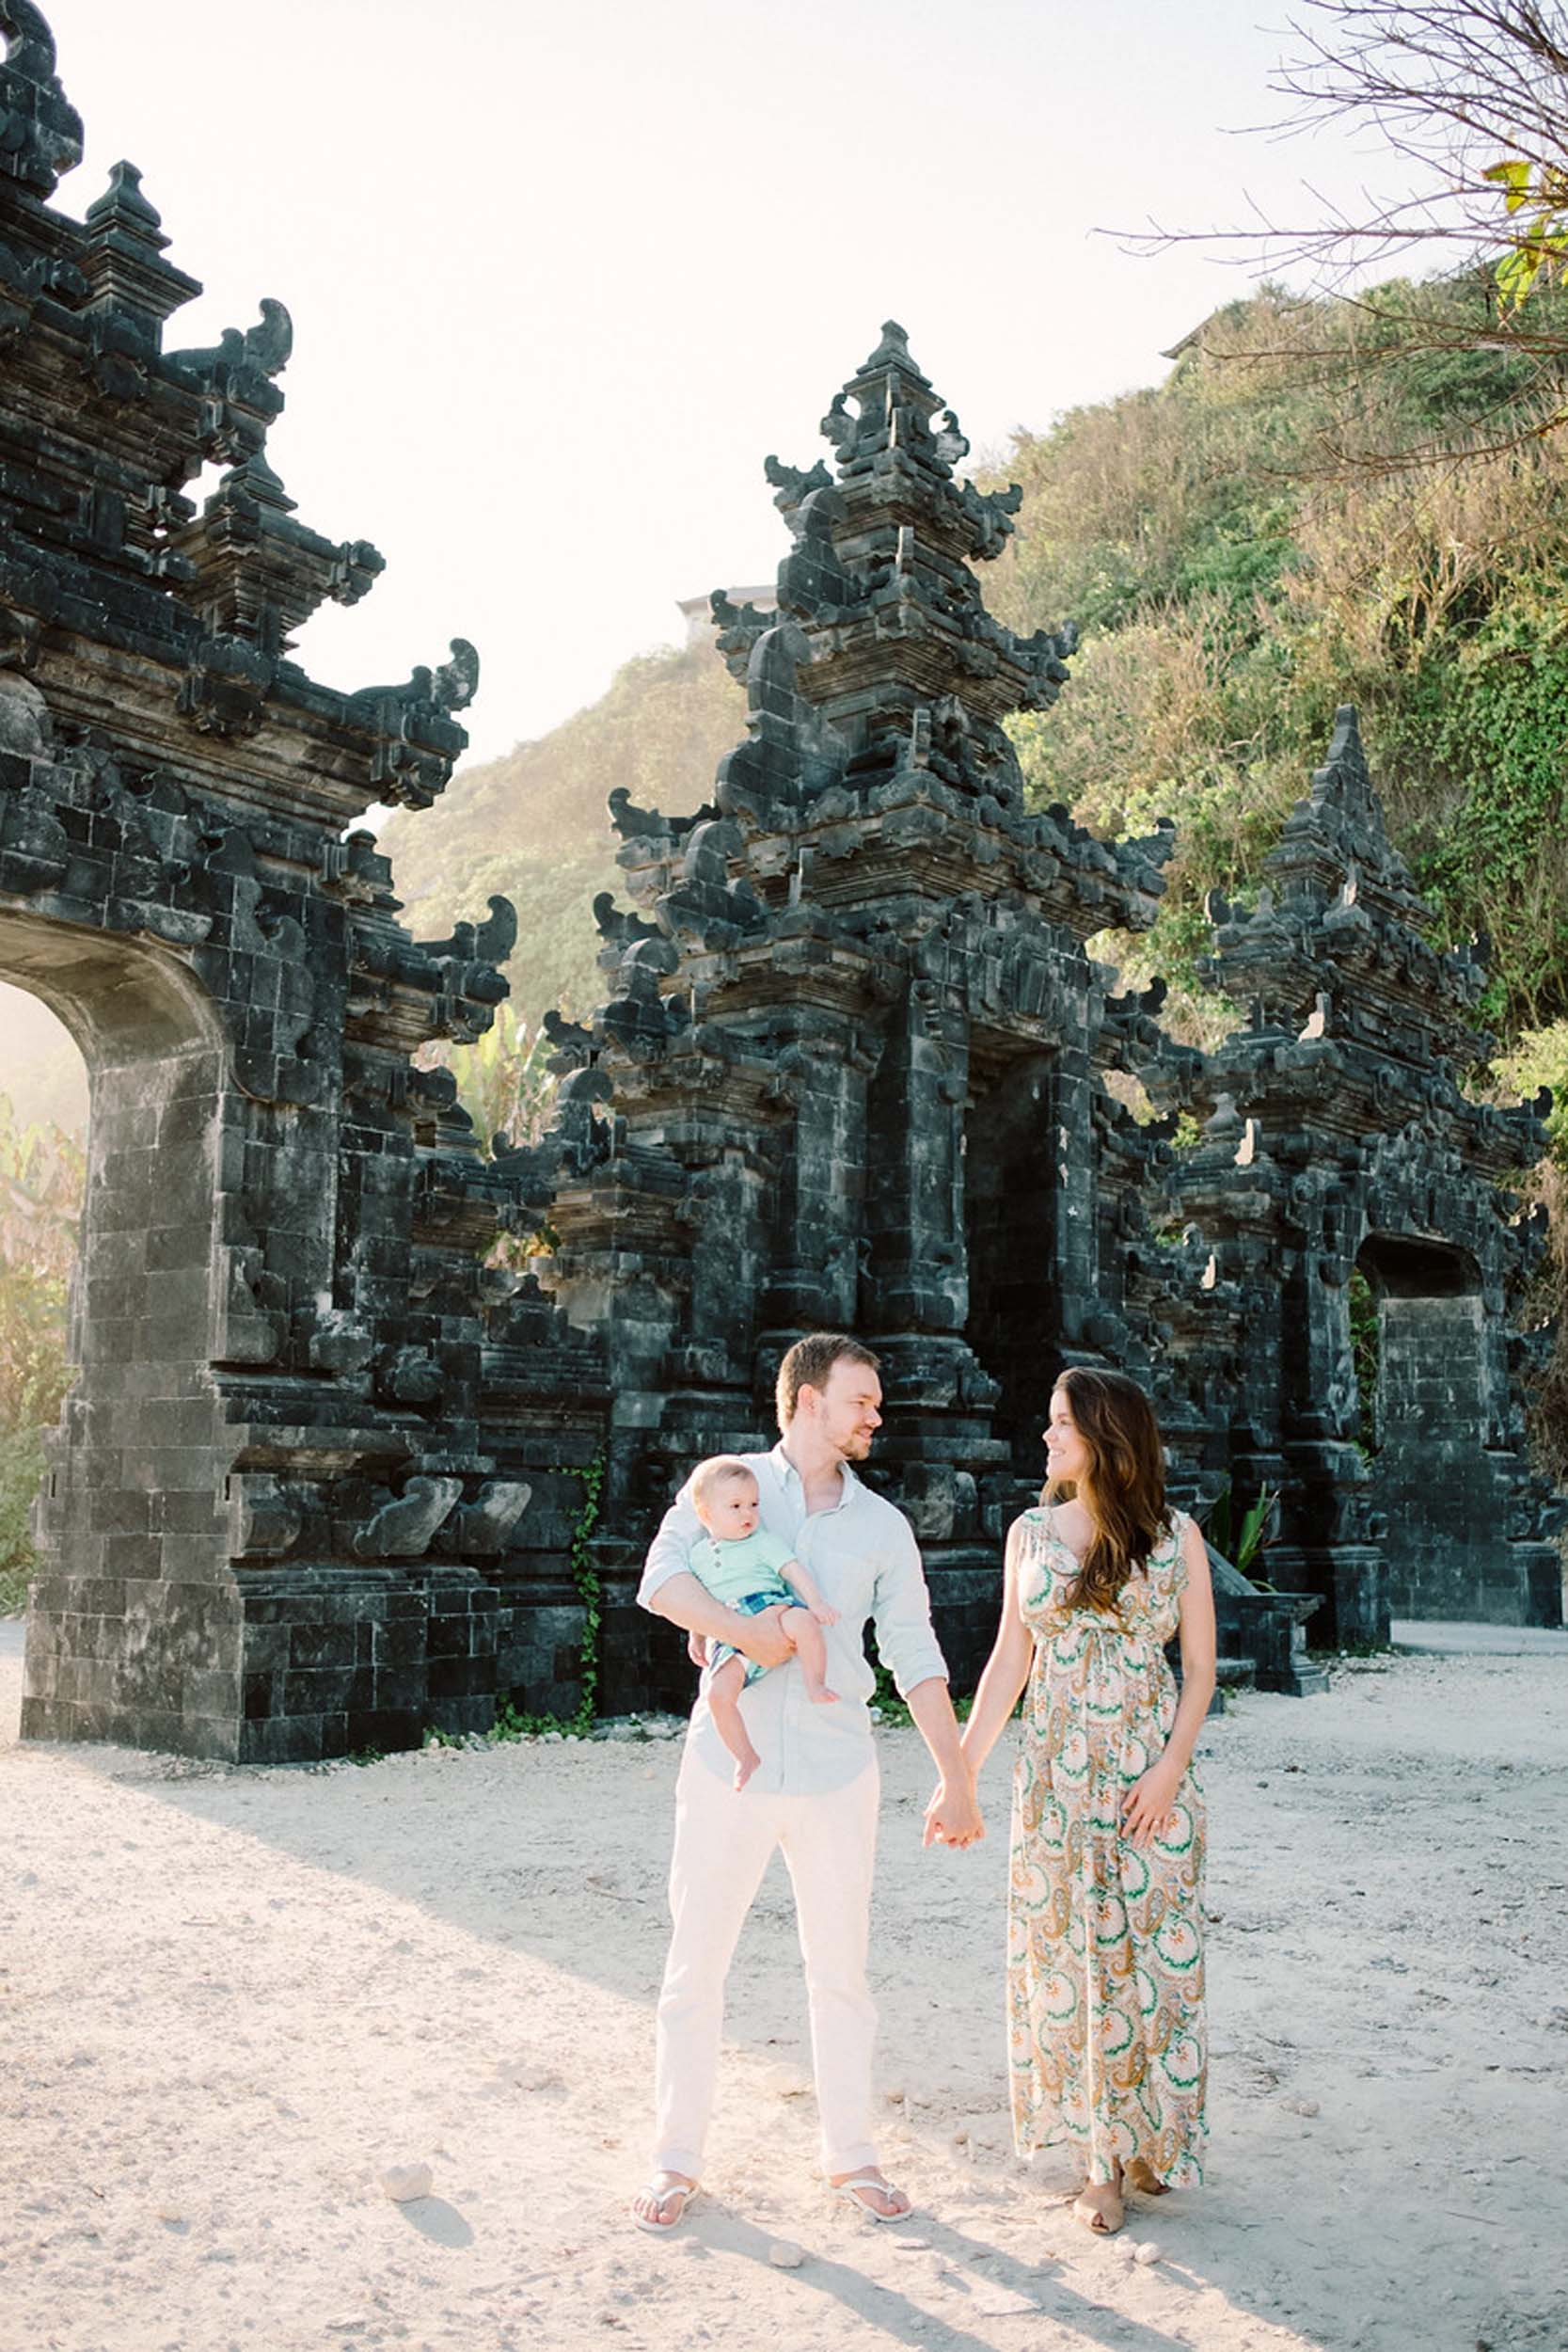 Flytographer:  Gusmank in Bali